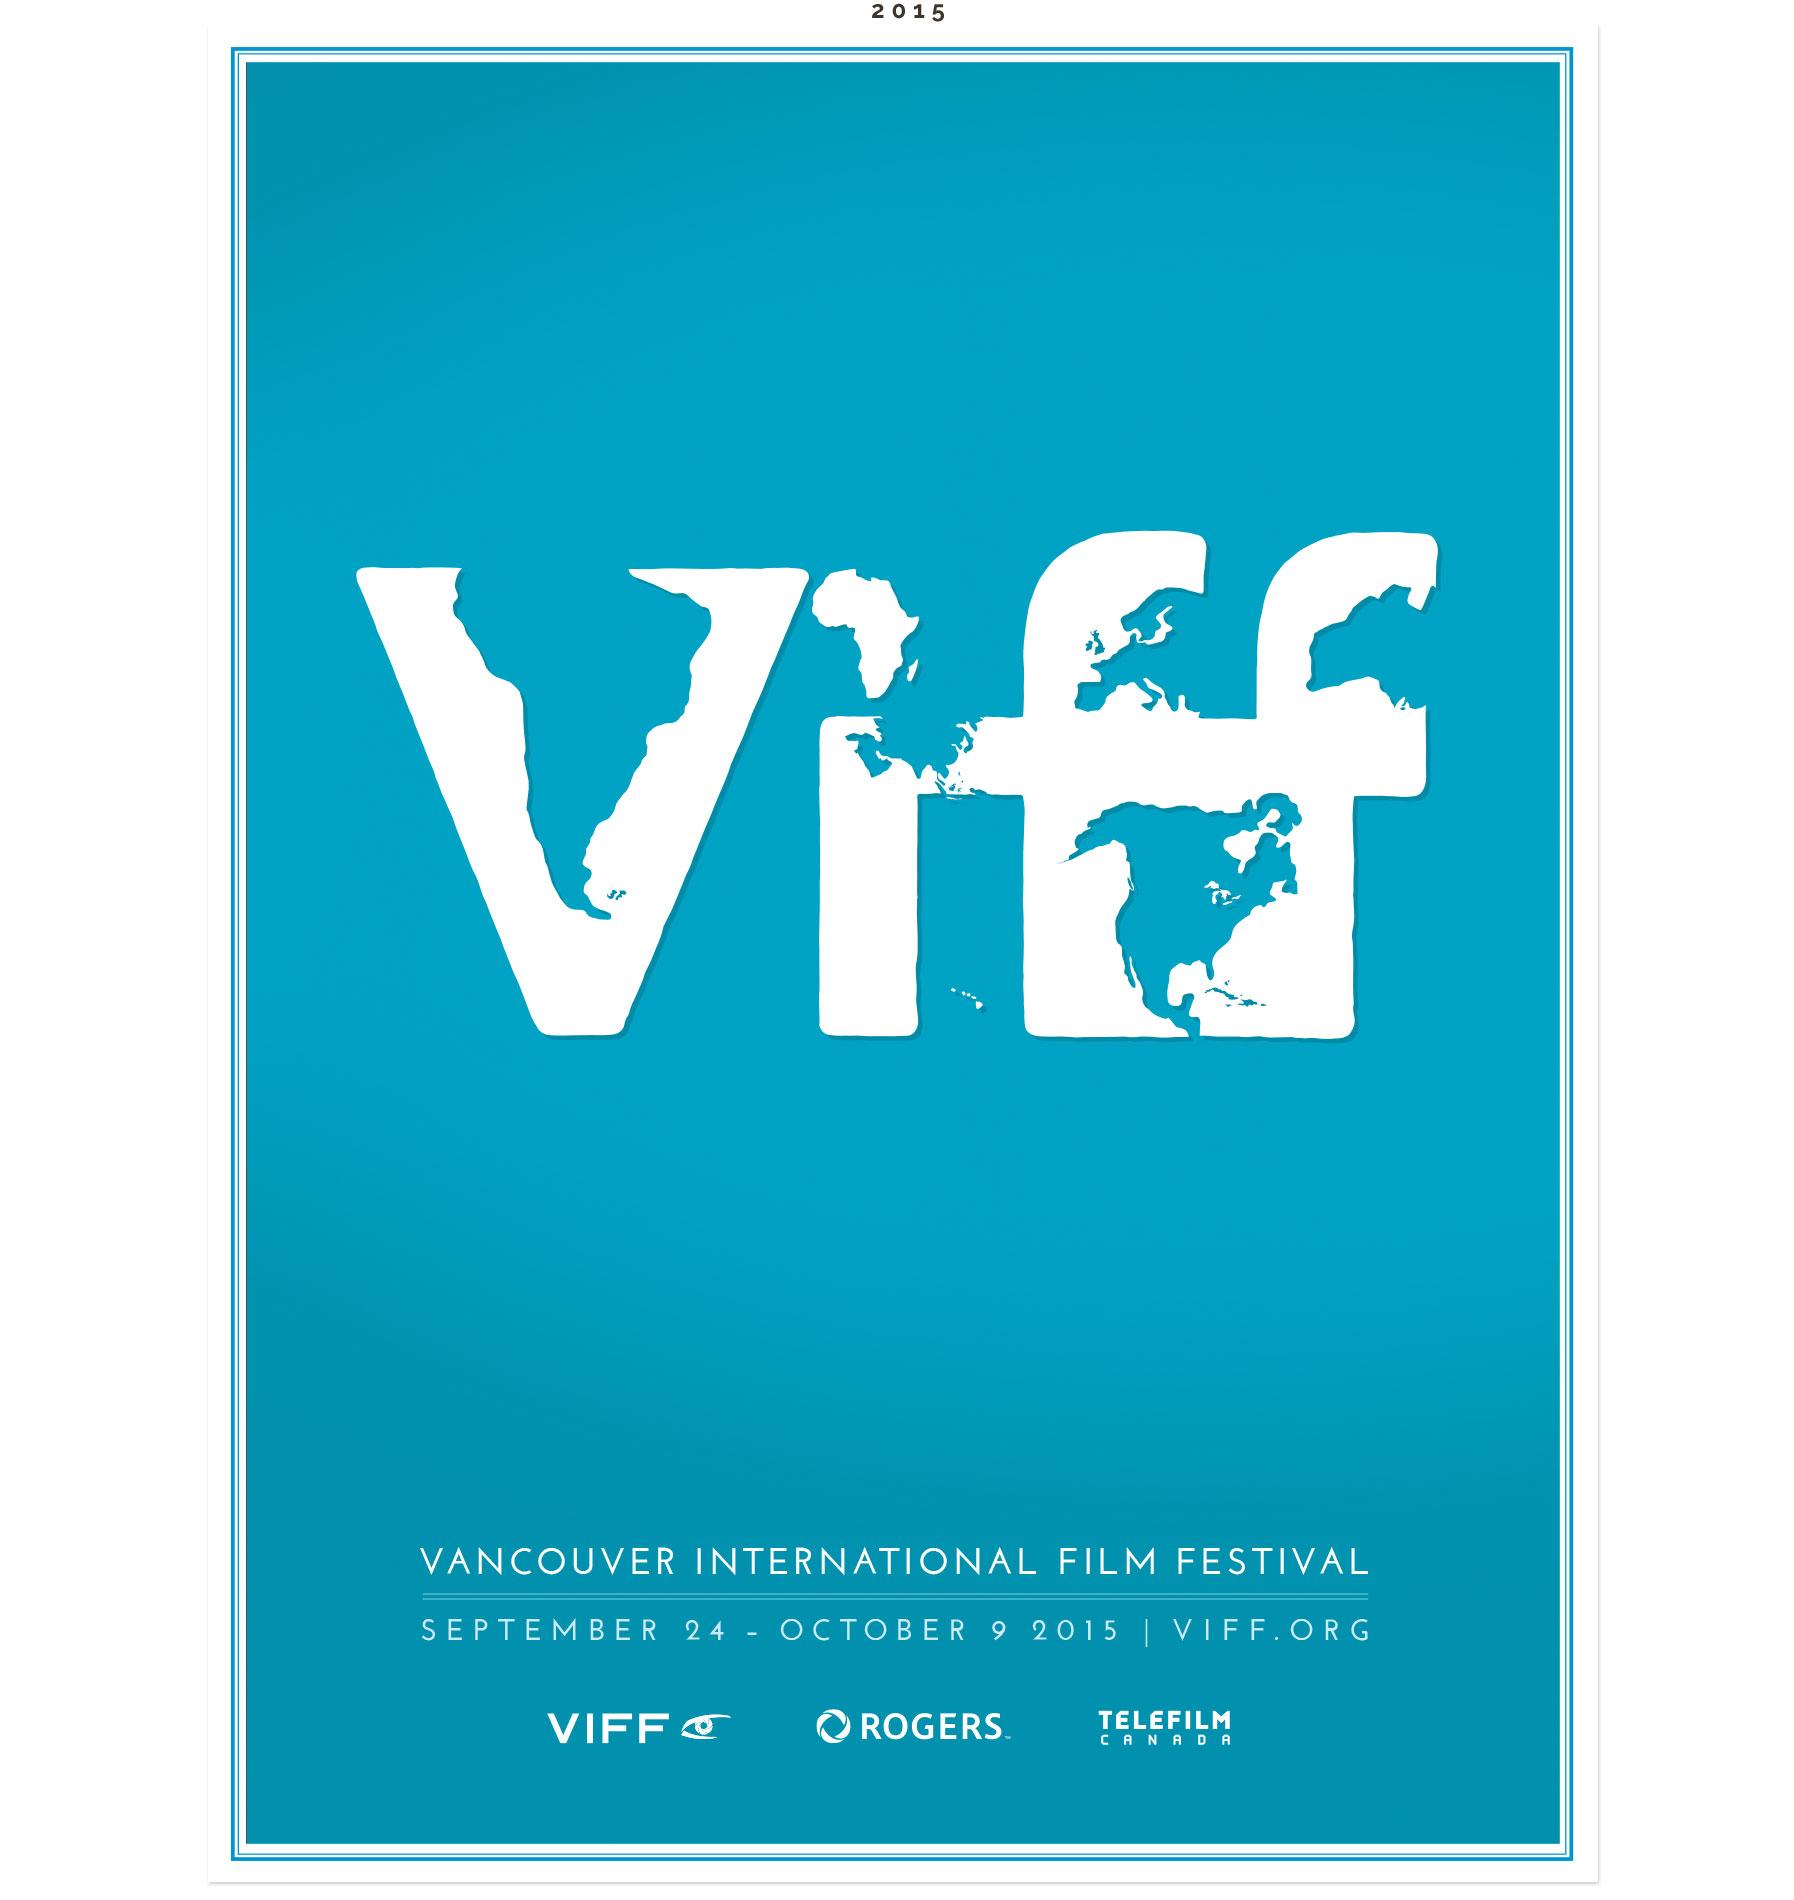 viff_2015